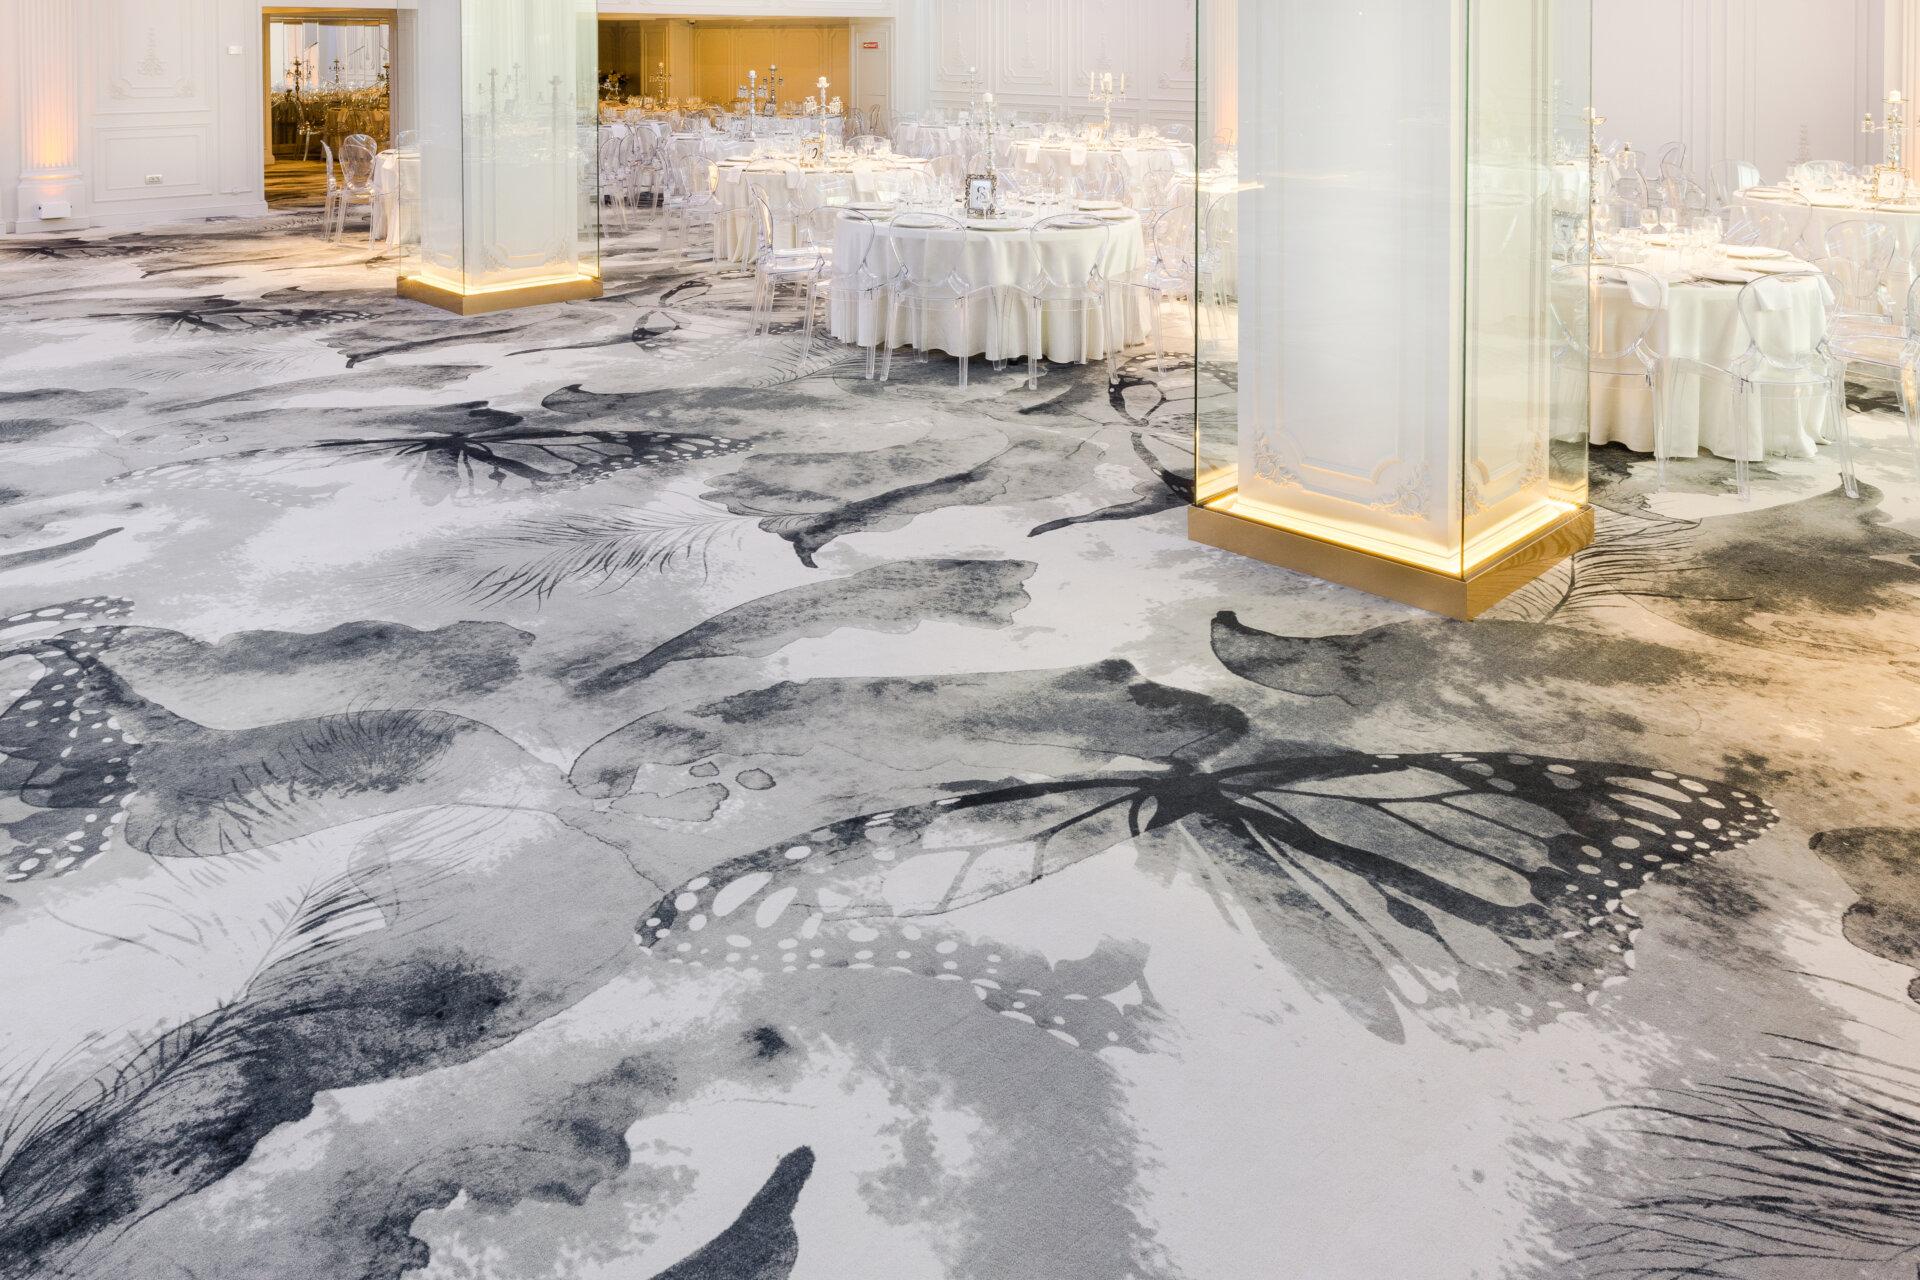 20210303-carpet&more-hotel-rocca-craiovaby-hugmedia-19